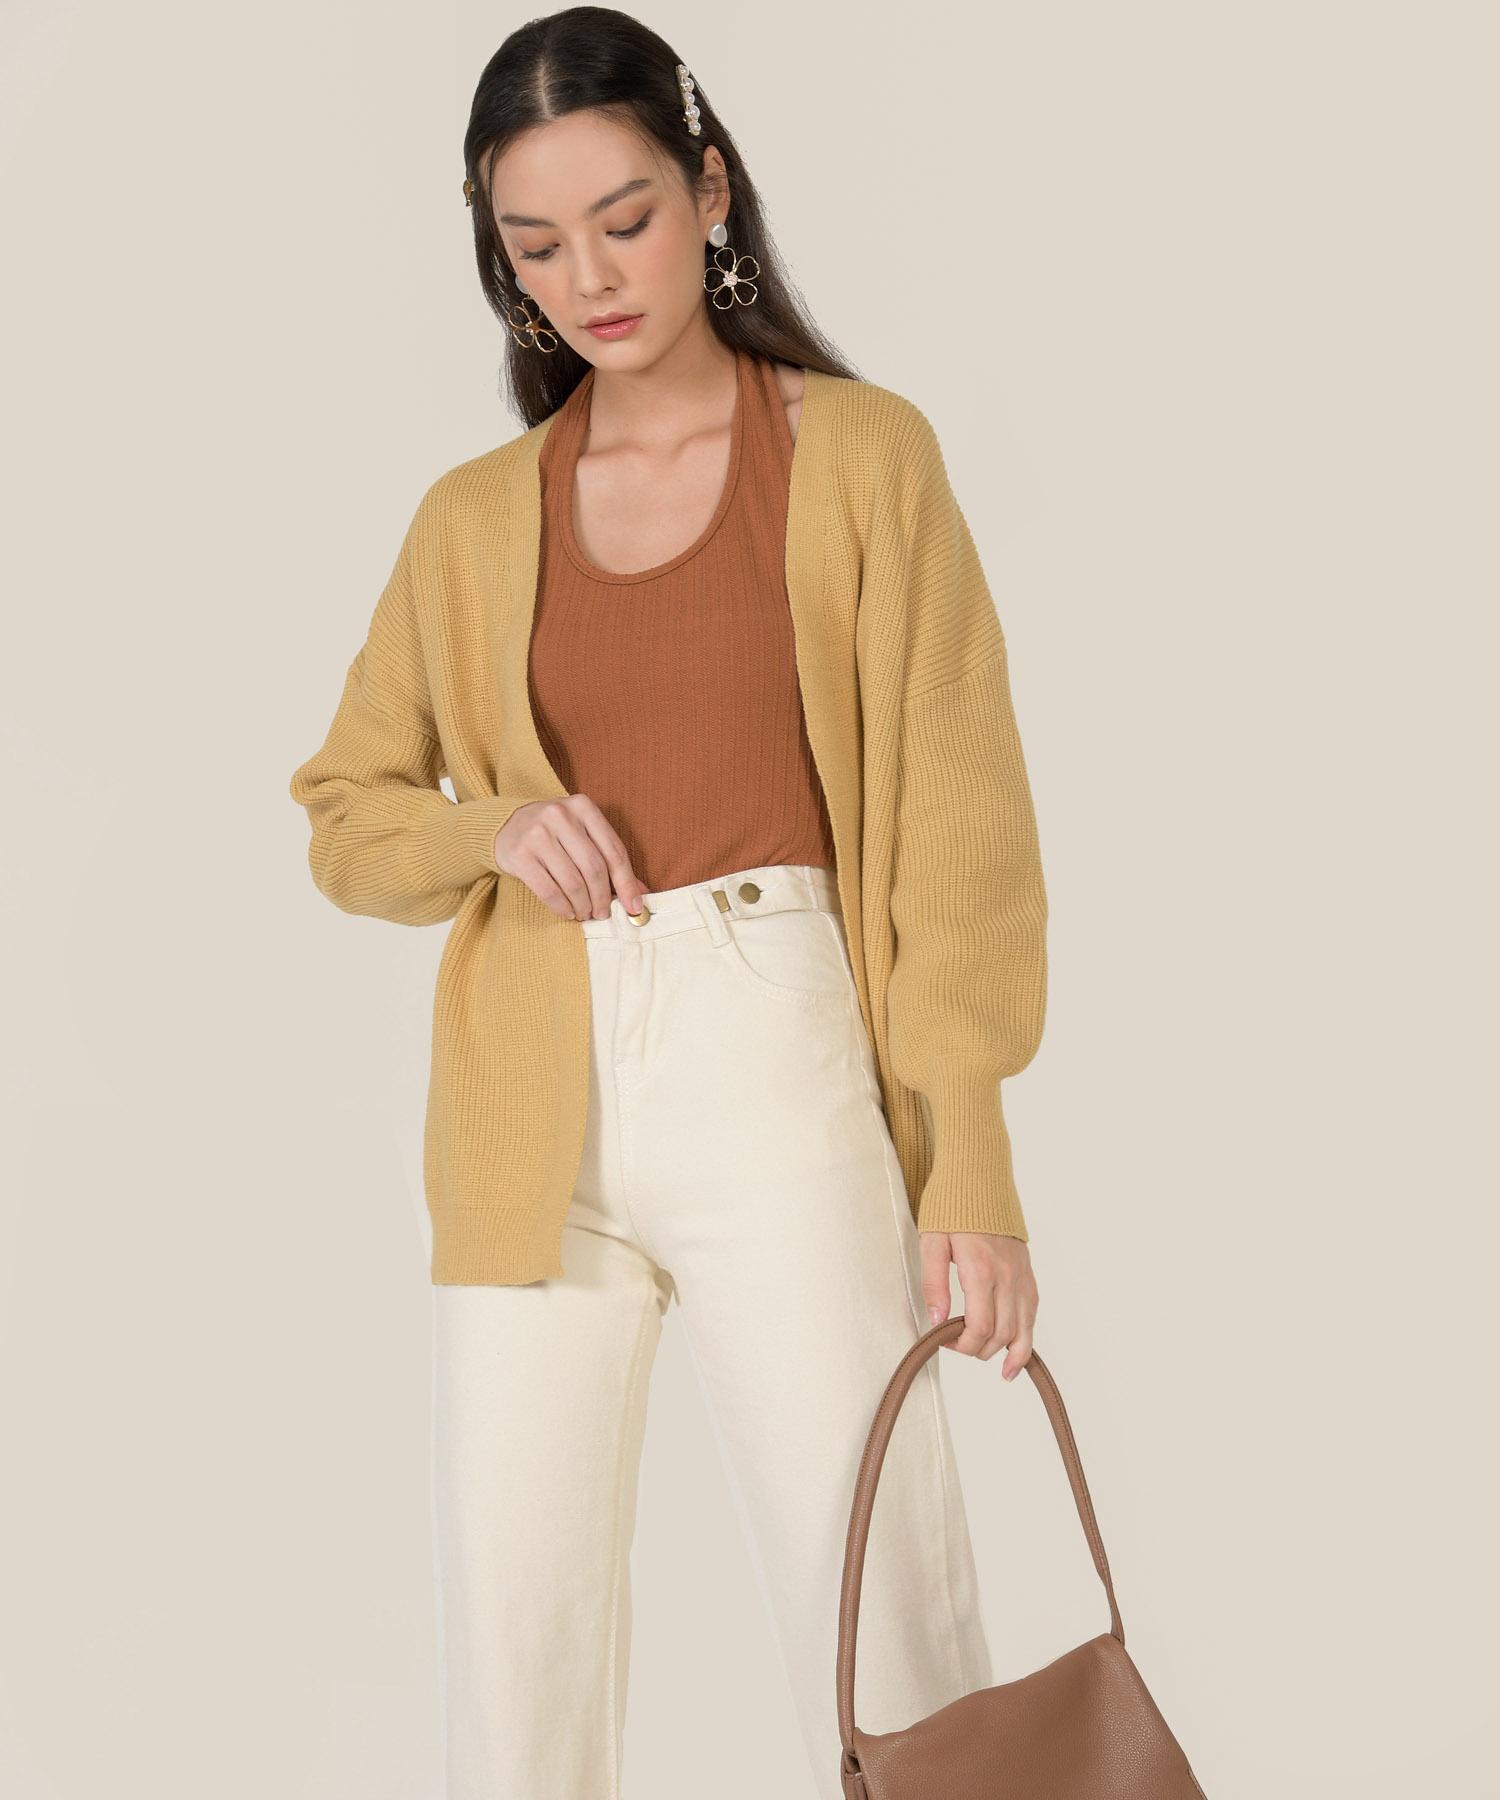 everett-knit-oversized-cardigan-dandelion-1